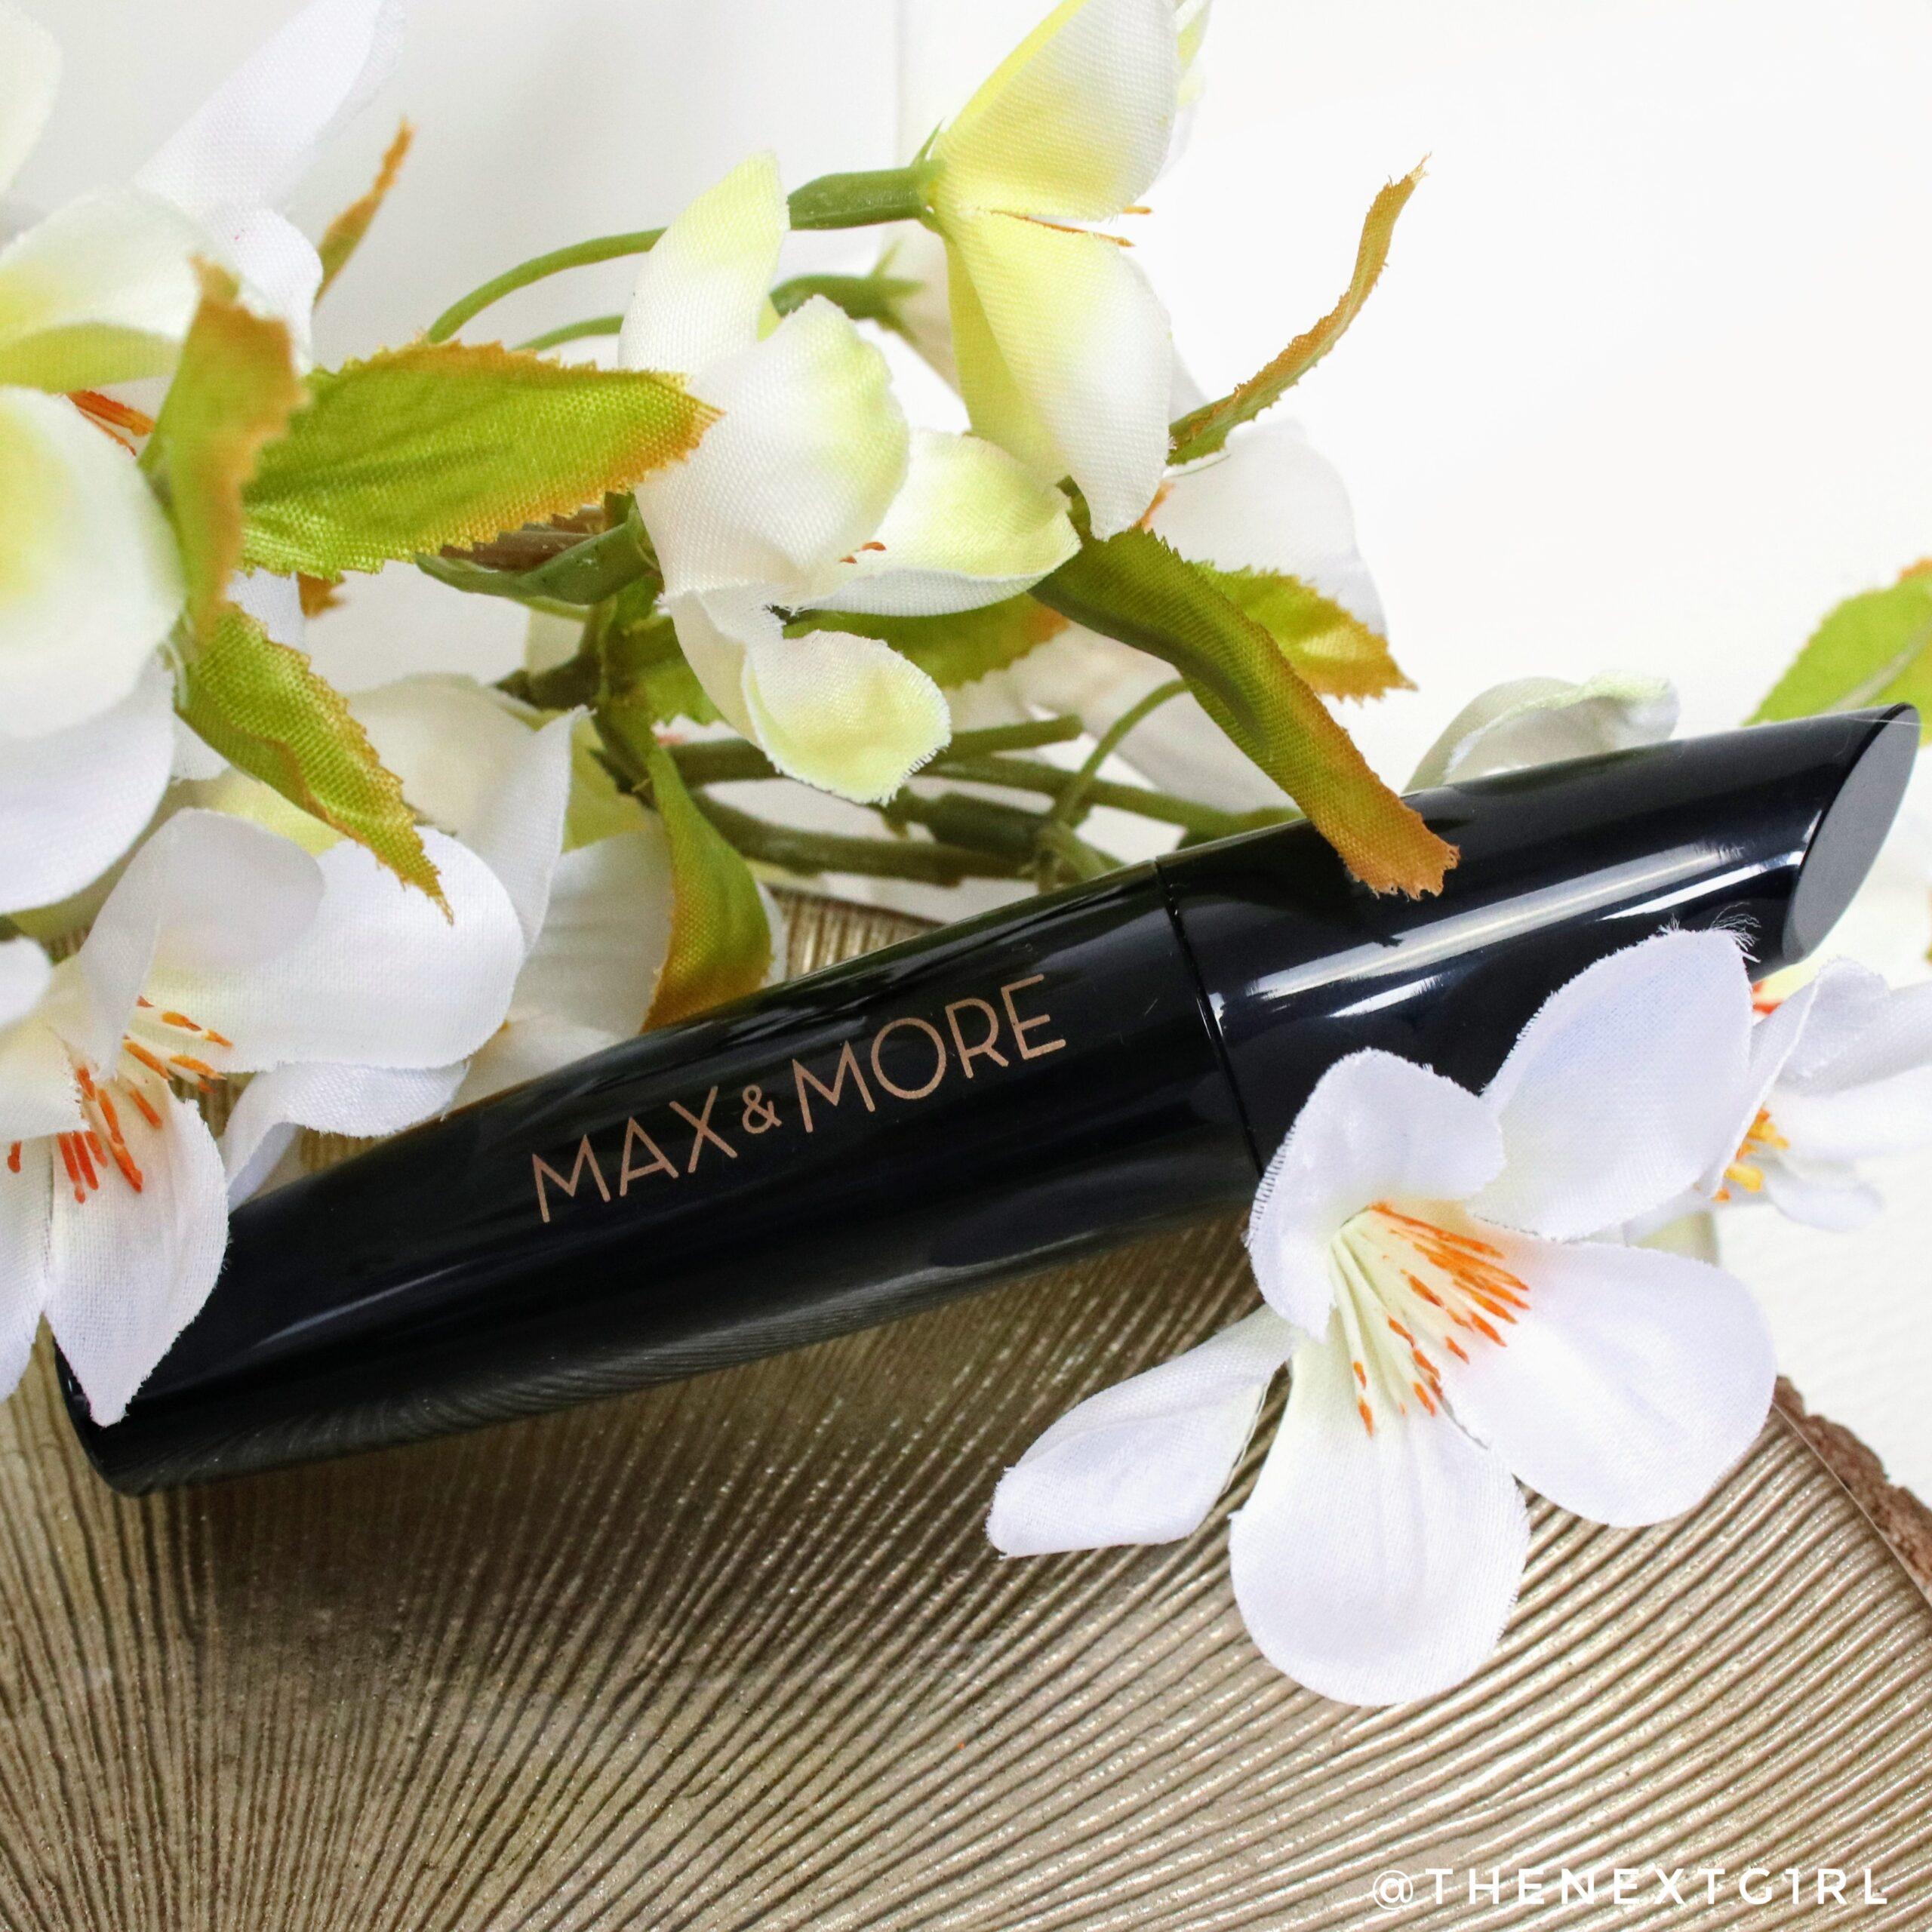 Max&More mascara nieuwe collectie 2020